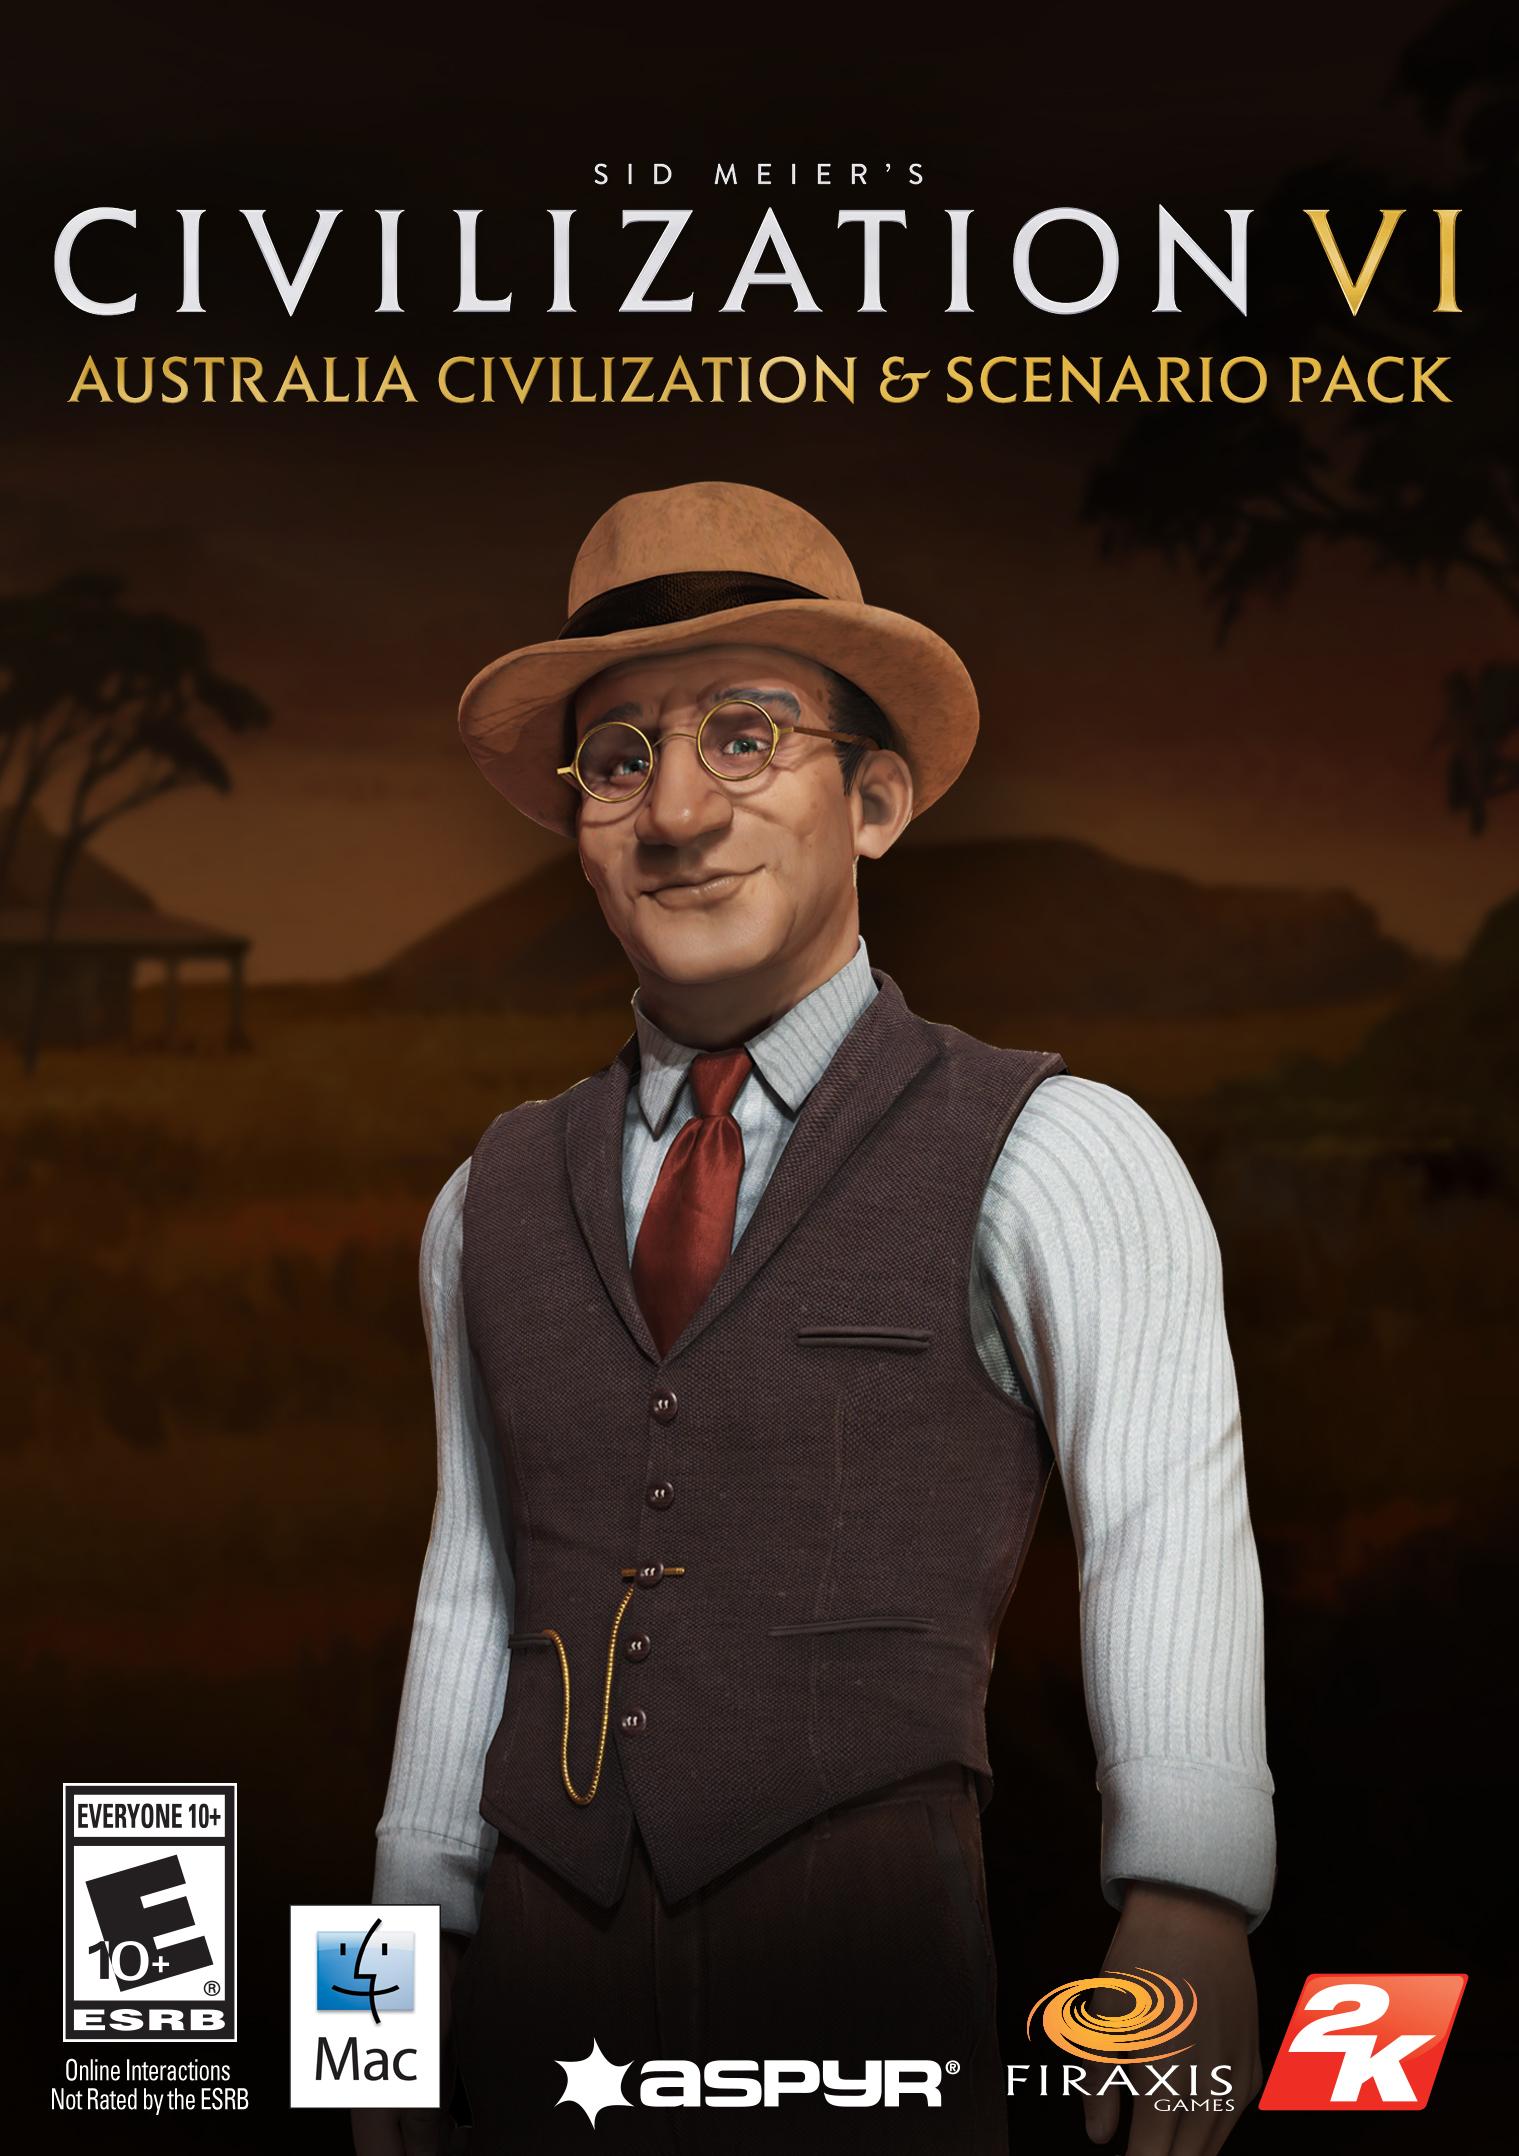 Sid Meier's Civilization VI - Australia Civilization & Scenario Pack (Mac) [Online Game - Australia Online